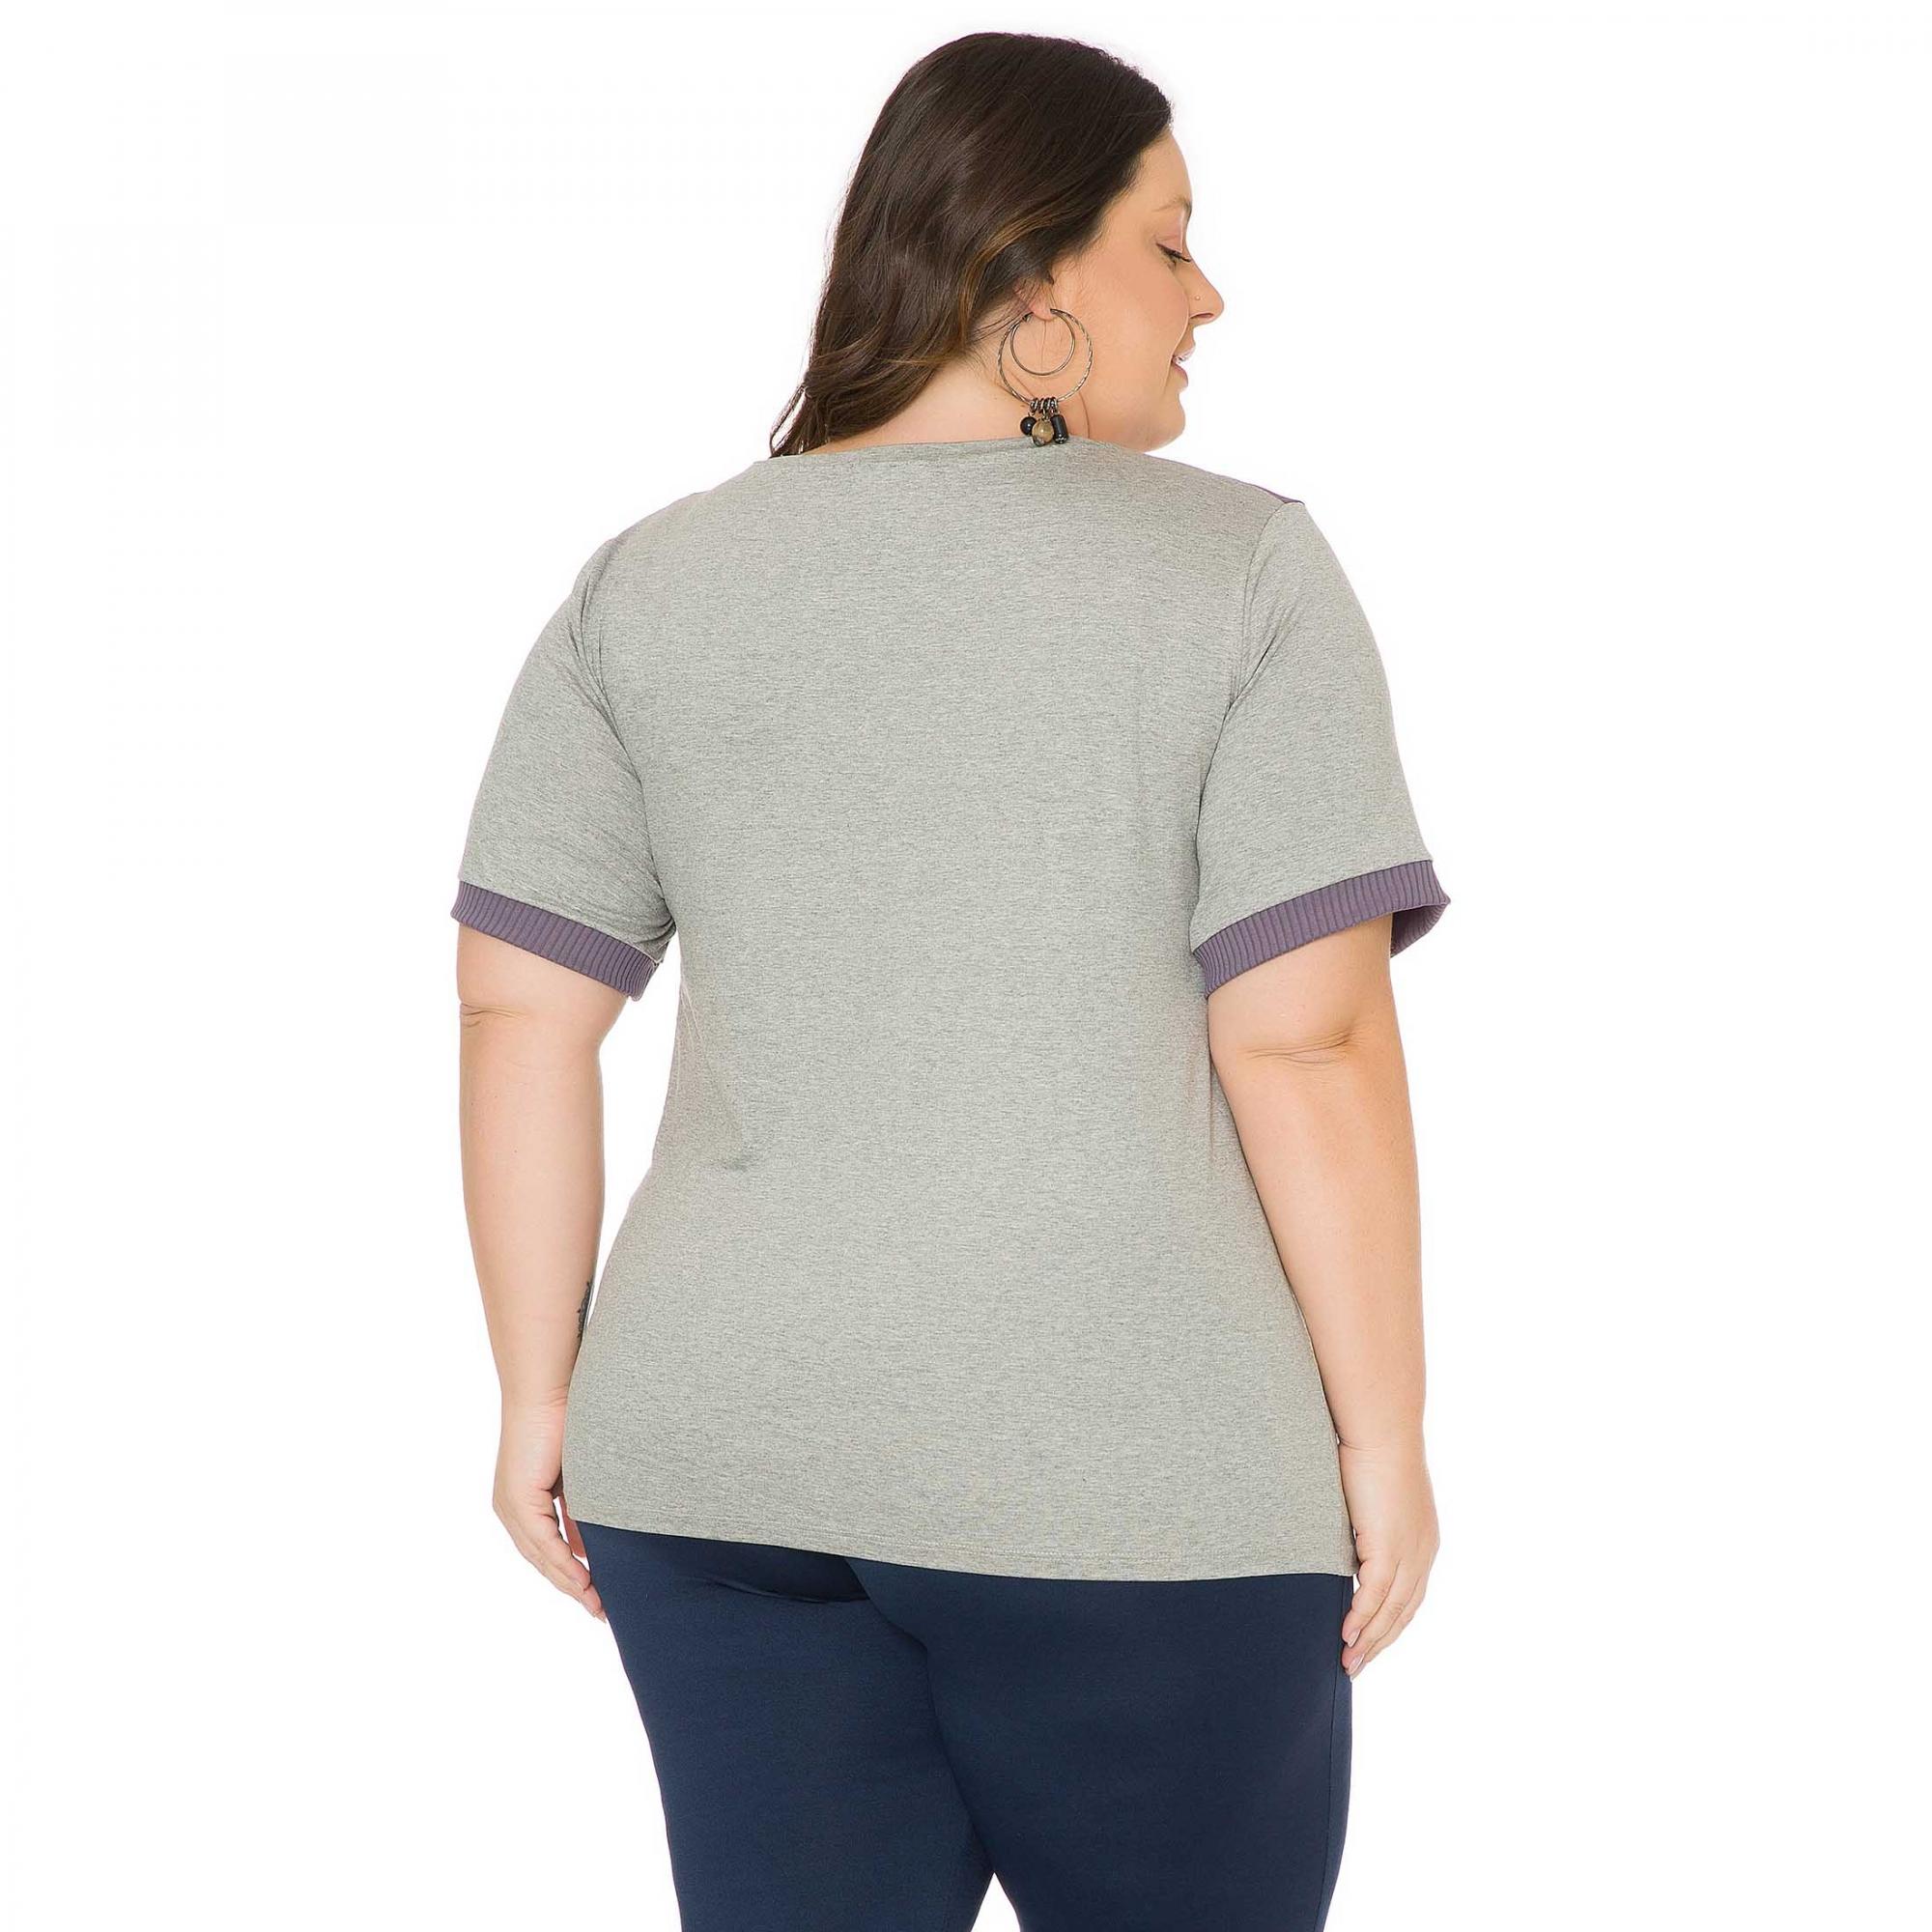 Blusa feminina Plus Size 103711